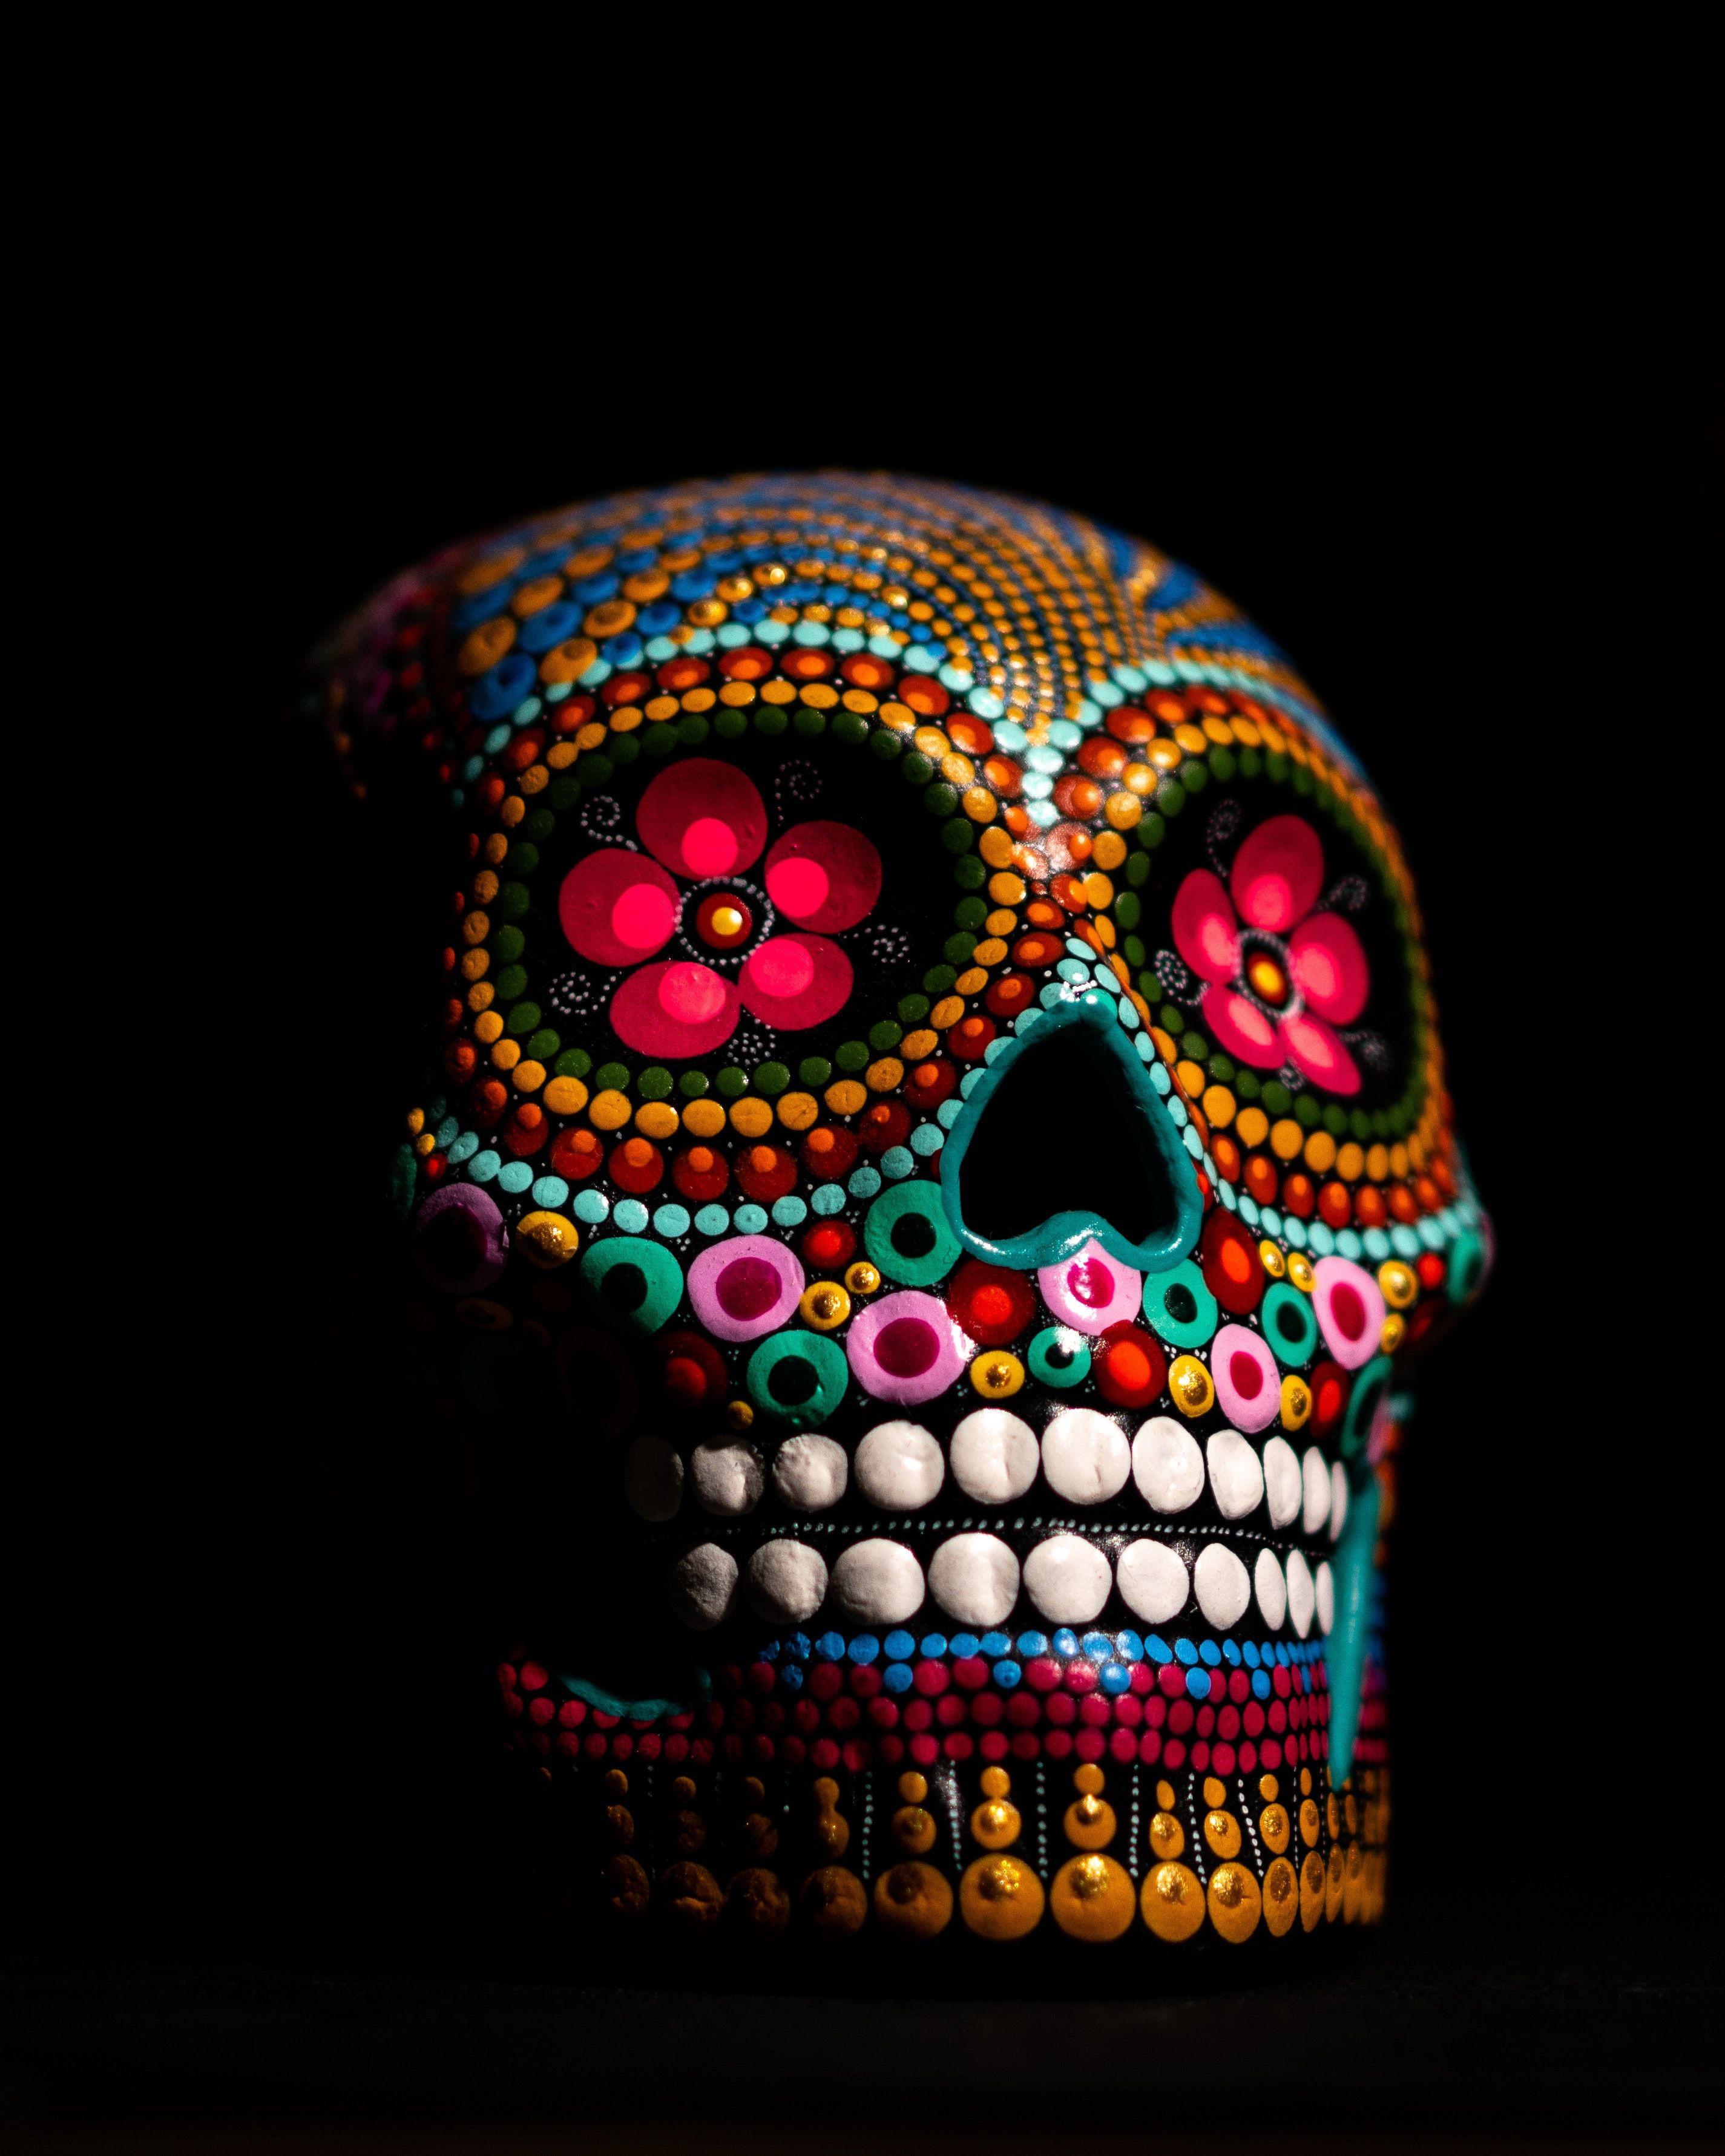 Skull Wallpaper 4k Skull Wallpaper Hd For Mobile Skull Skull Hd